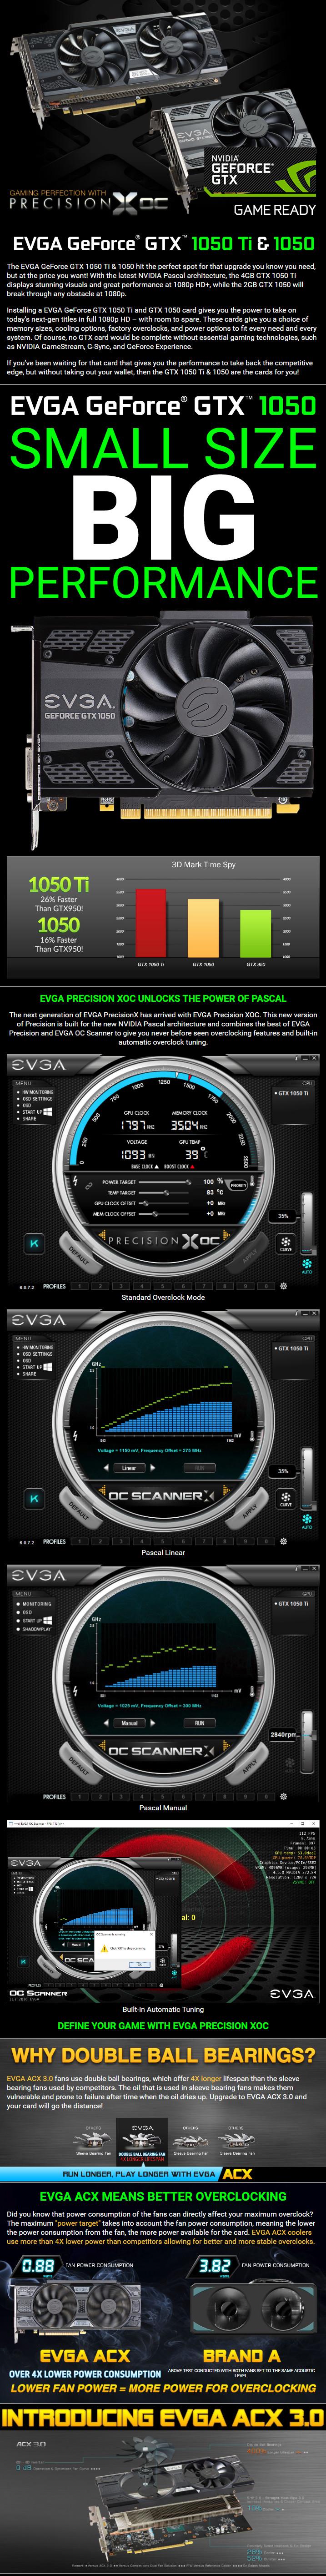 Graphics card EVGA GeForce GTX 1050 SSC GAMING ACX 02G-P4-6154-KR